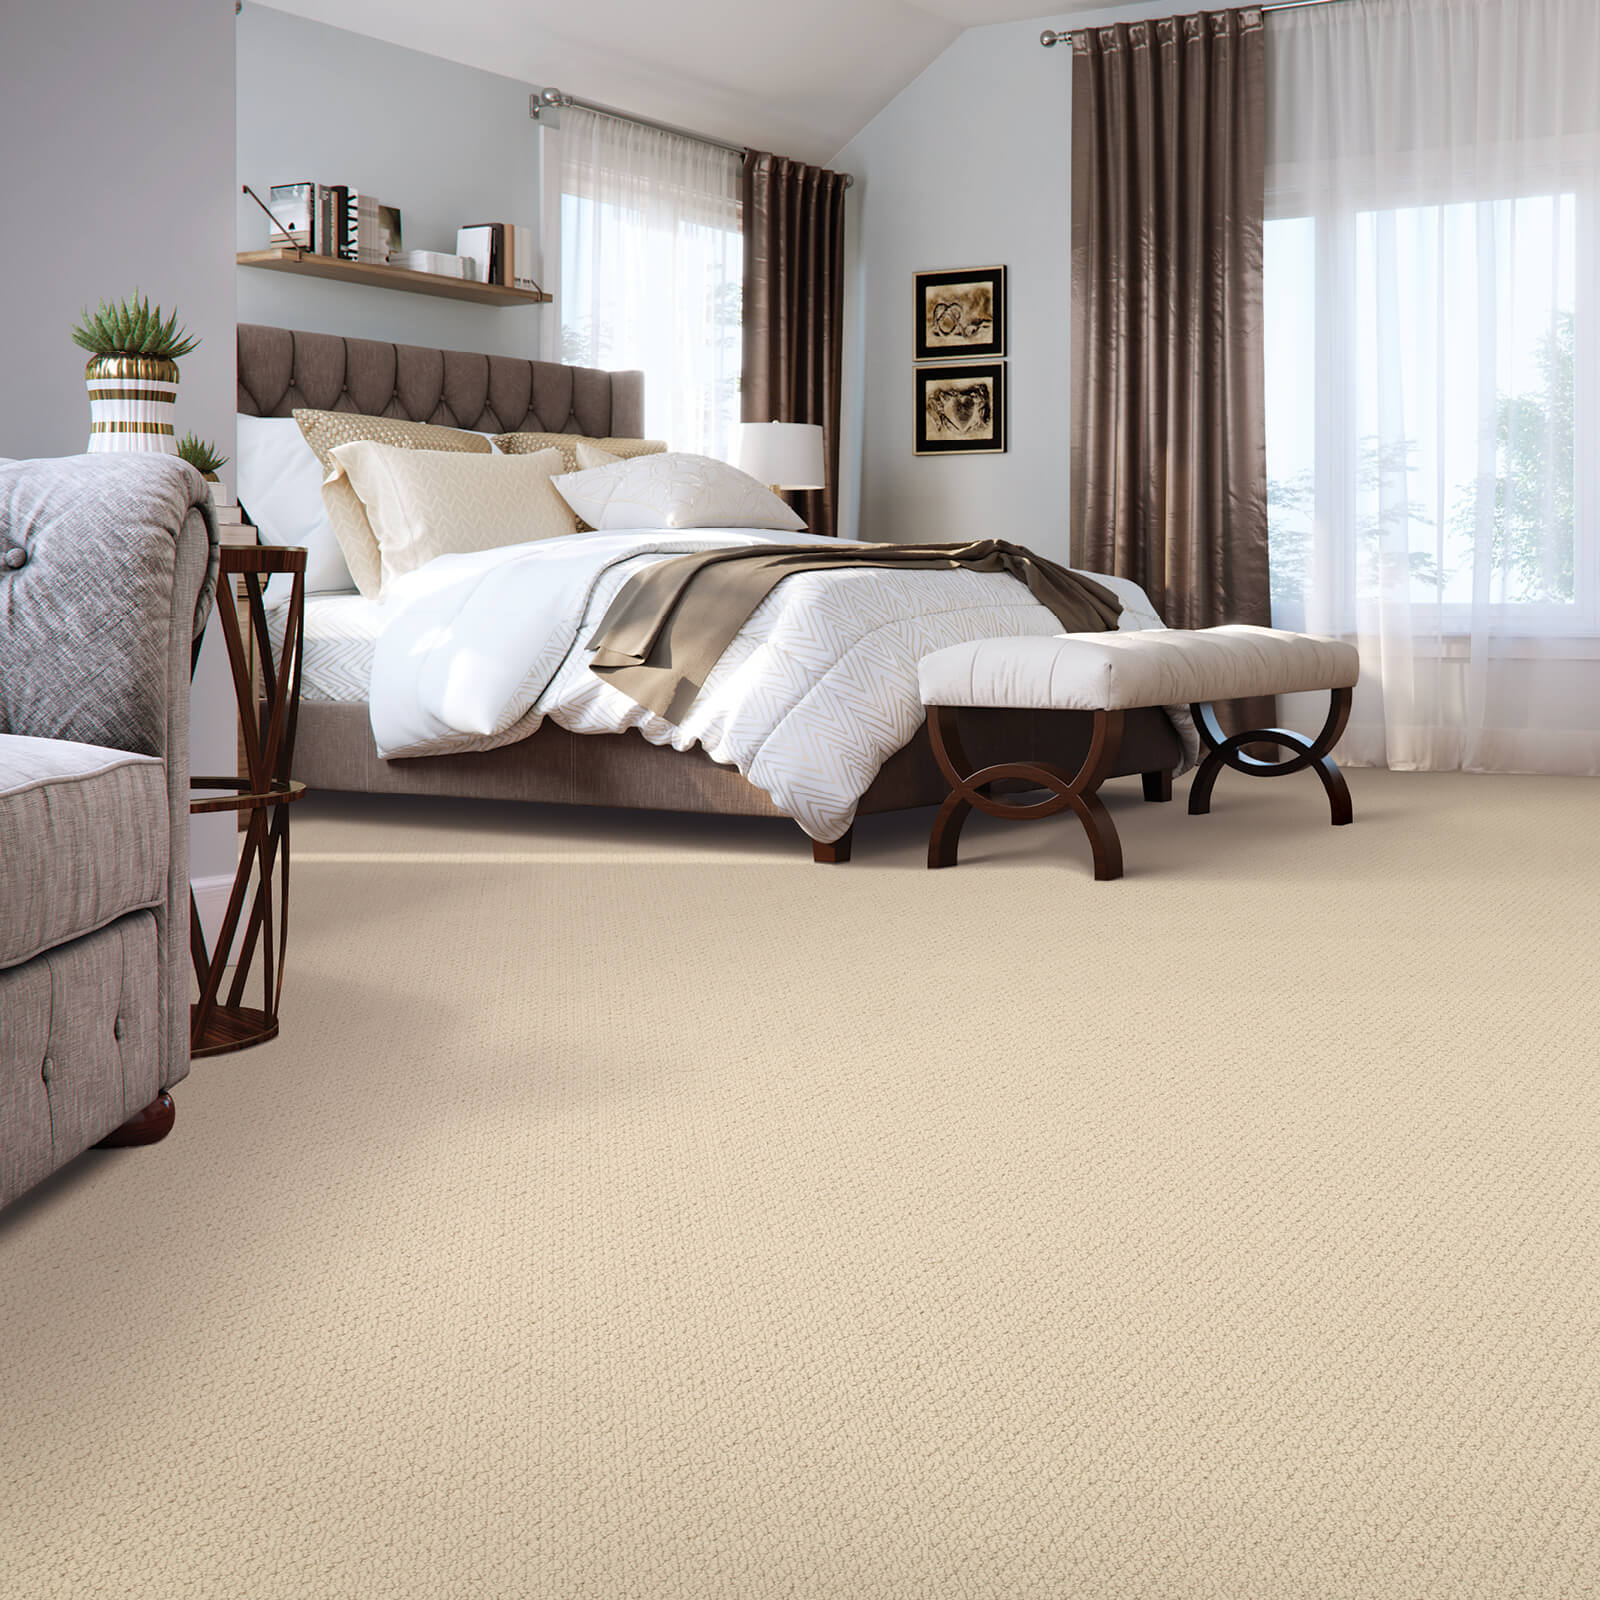 New carpet in bedroom | J/K Carpet Center, Inc